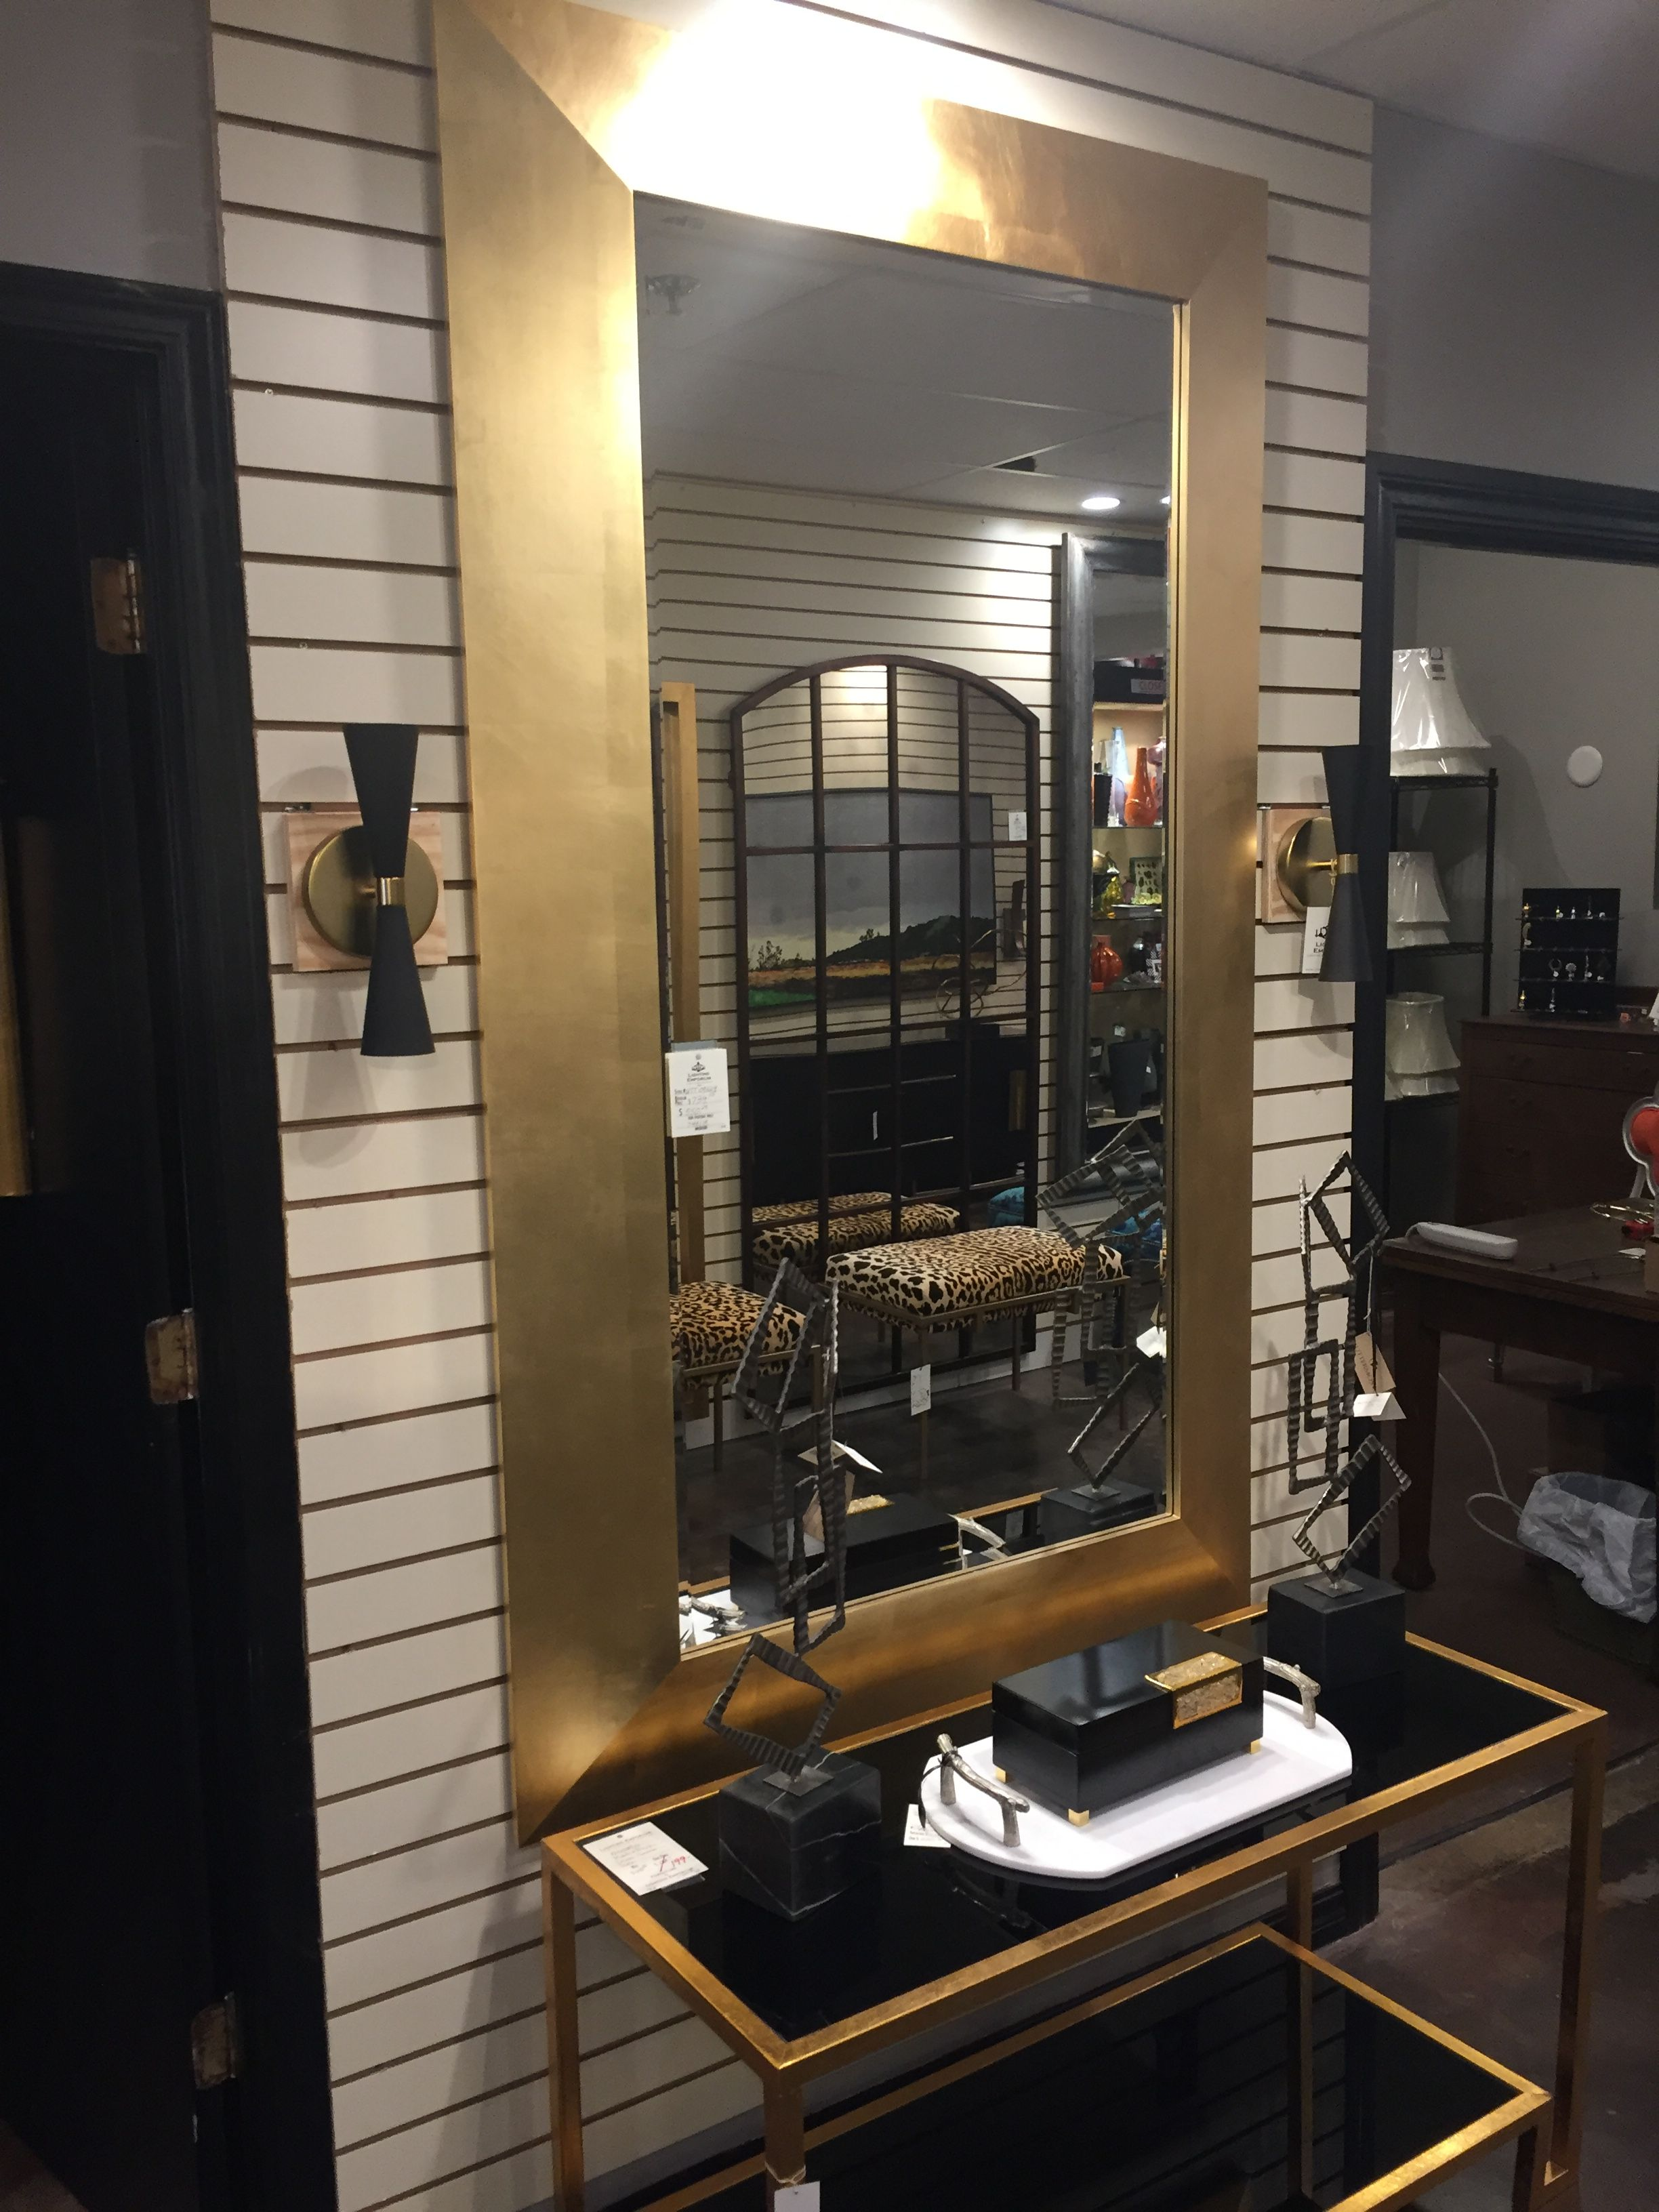 Pin by diymom on mirrors Mirror, Vanity mirror, Home decor